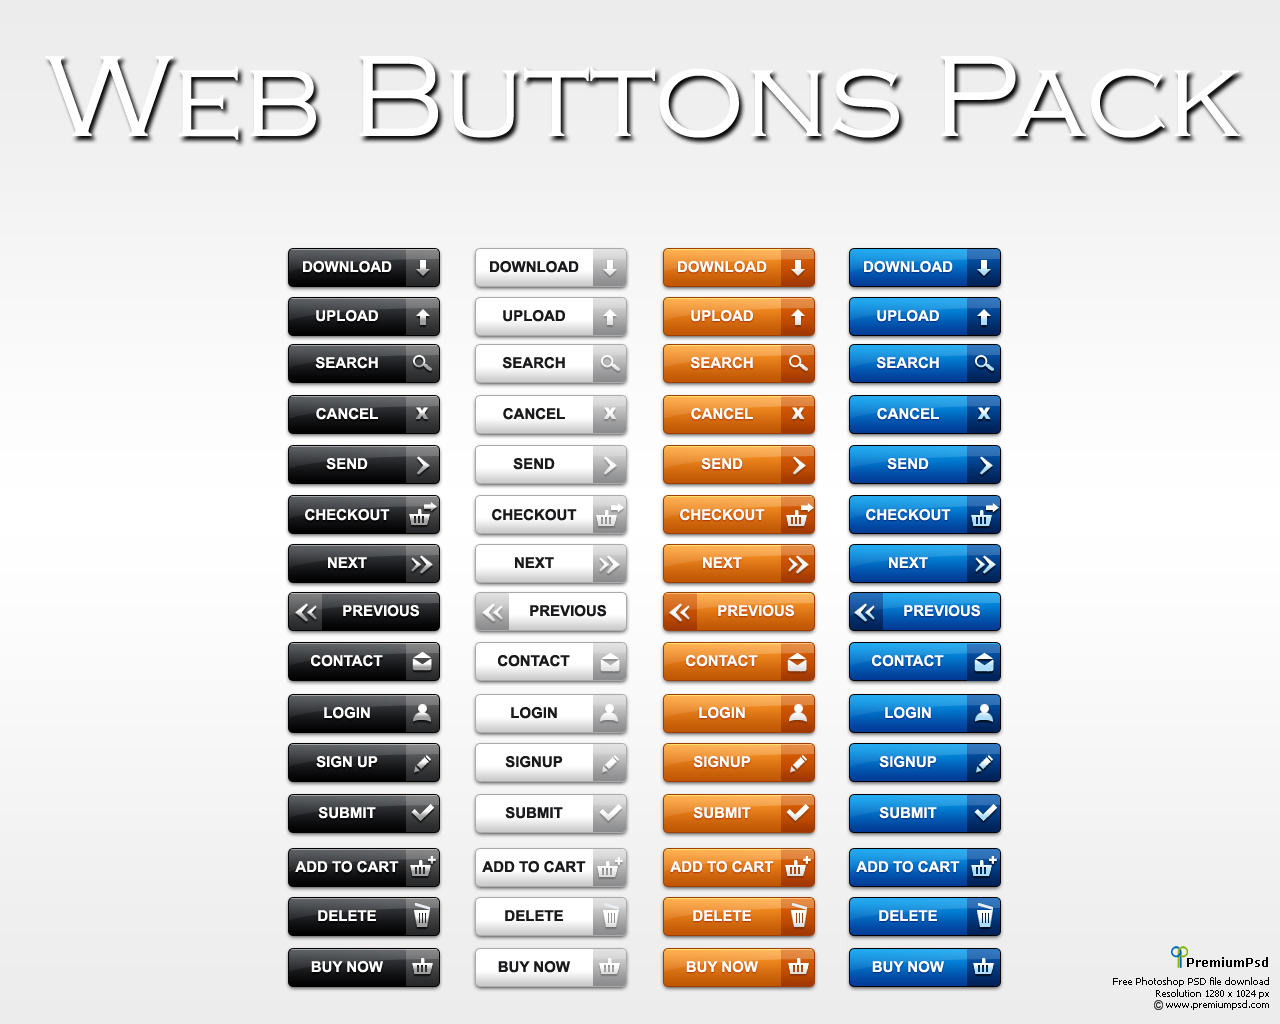 Visiting Cards Backgrounds Rectangular Web Buttons Pack Psd Premium 414758 Wallpaper wallpaper